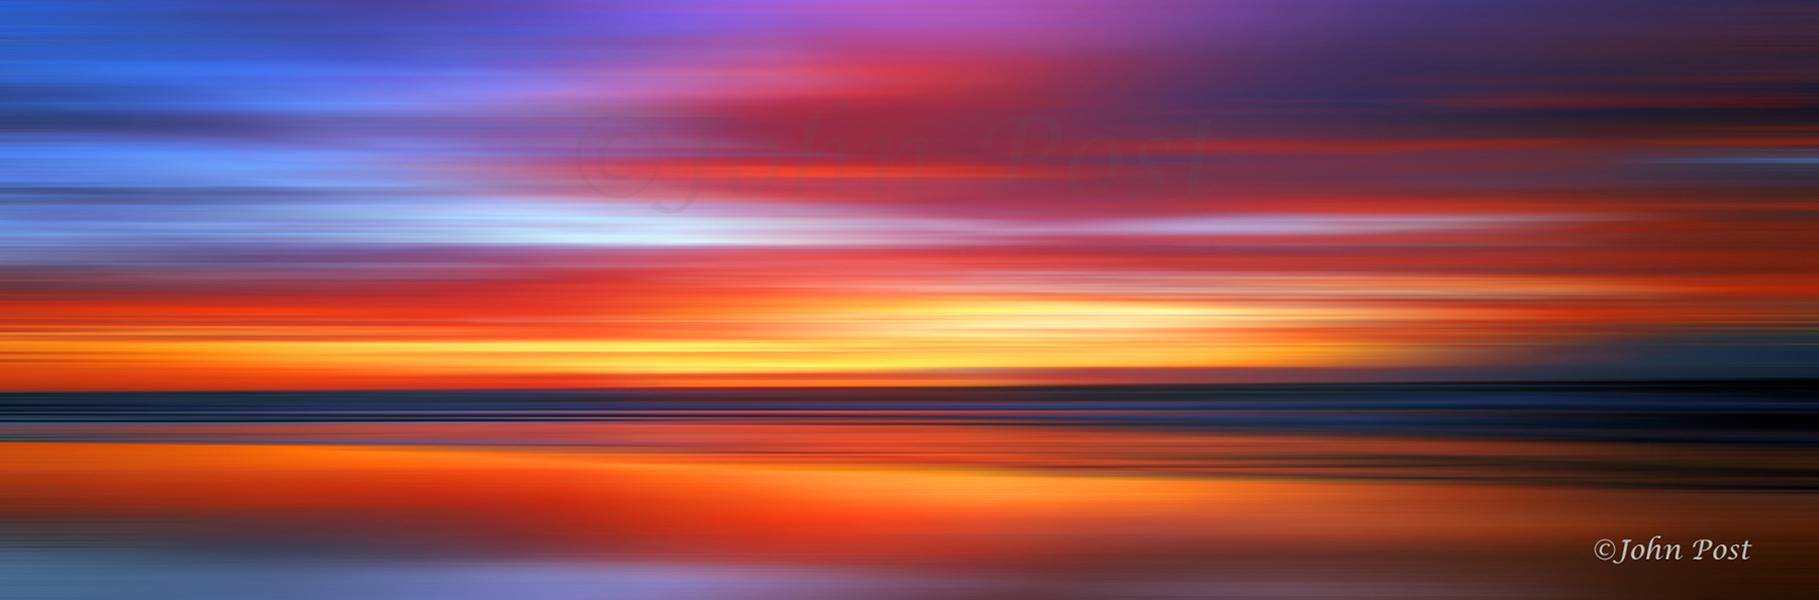 Seascape 140 Sunrise Panorama by John Post Manhattan Beach Photogrpher